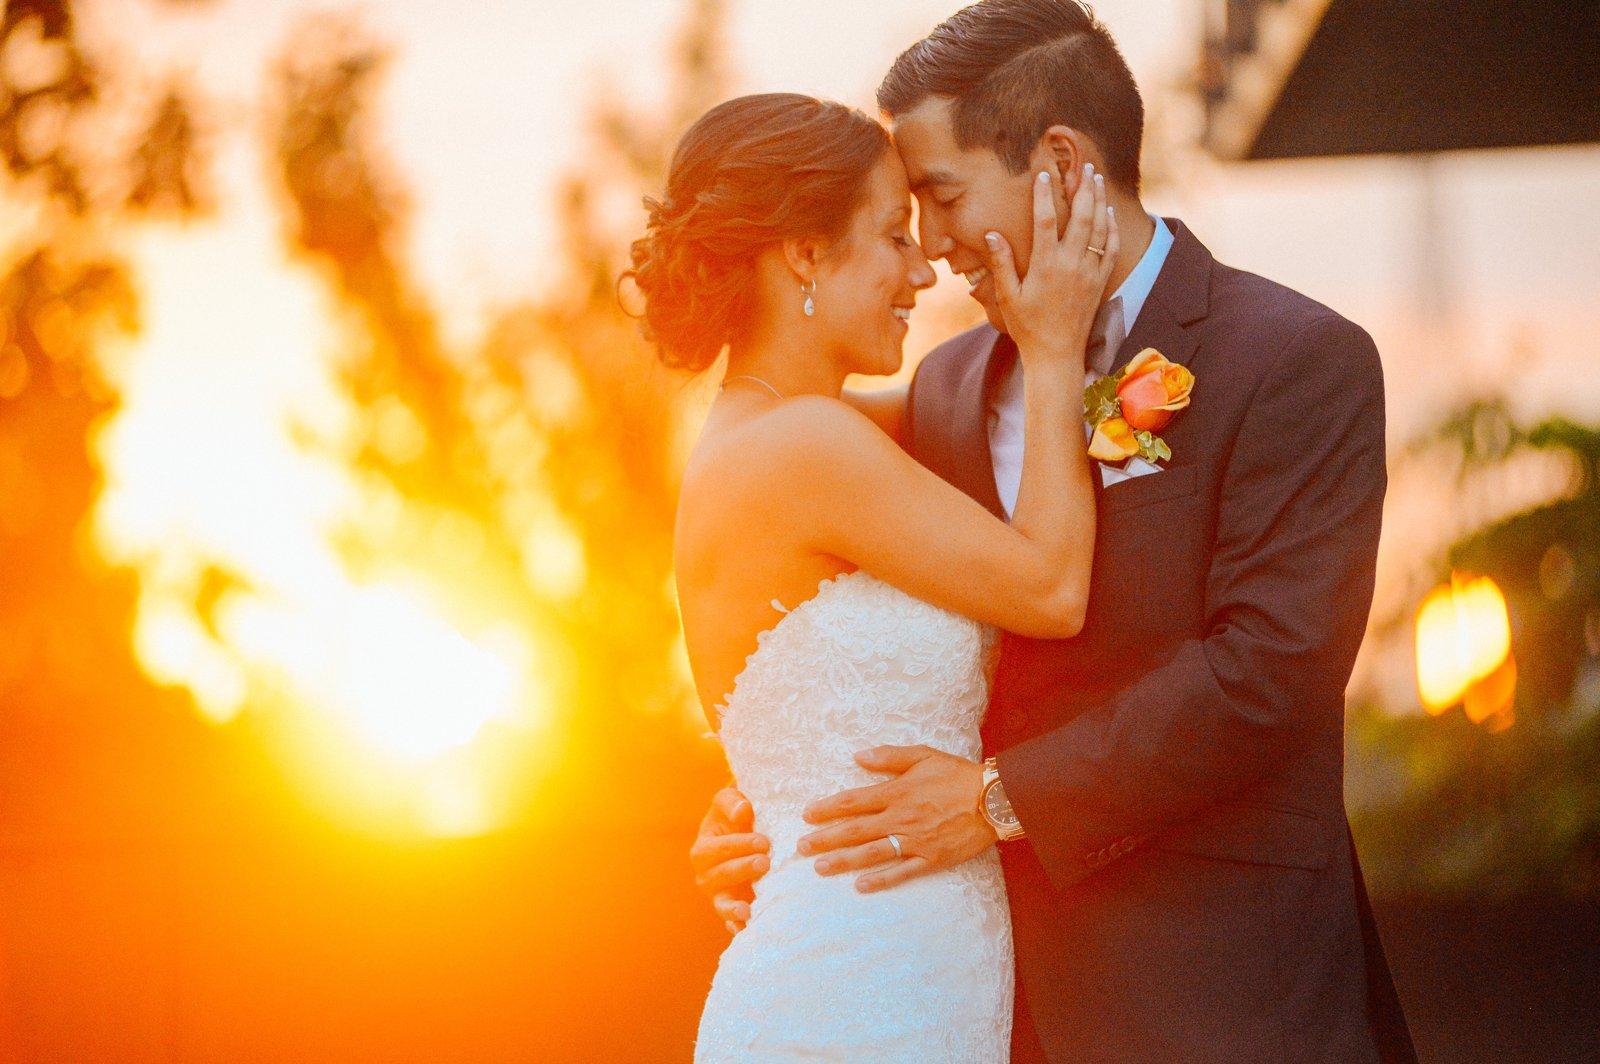 Bridalbliss.com | Seattle Wedding | Washington Event Coordination and Design | Jerome Tso Photography